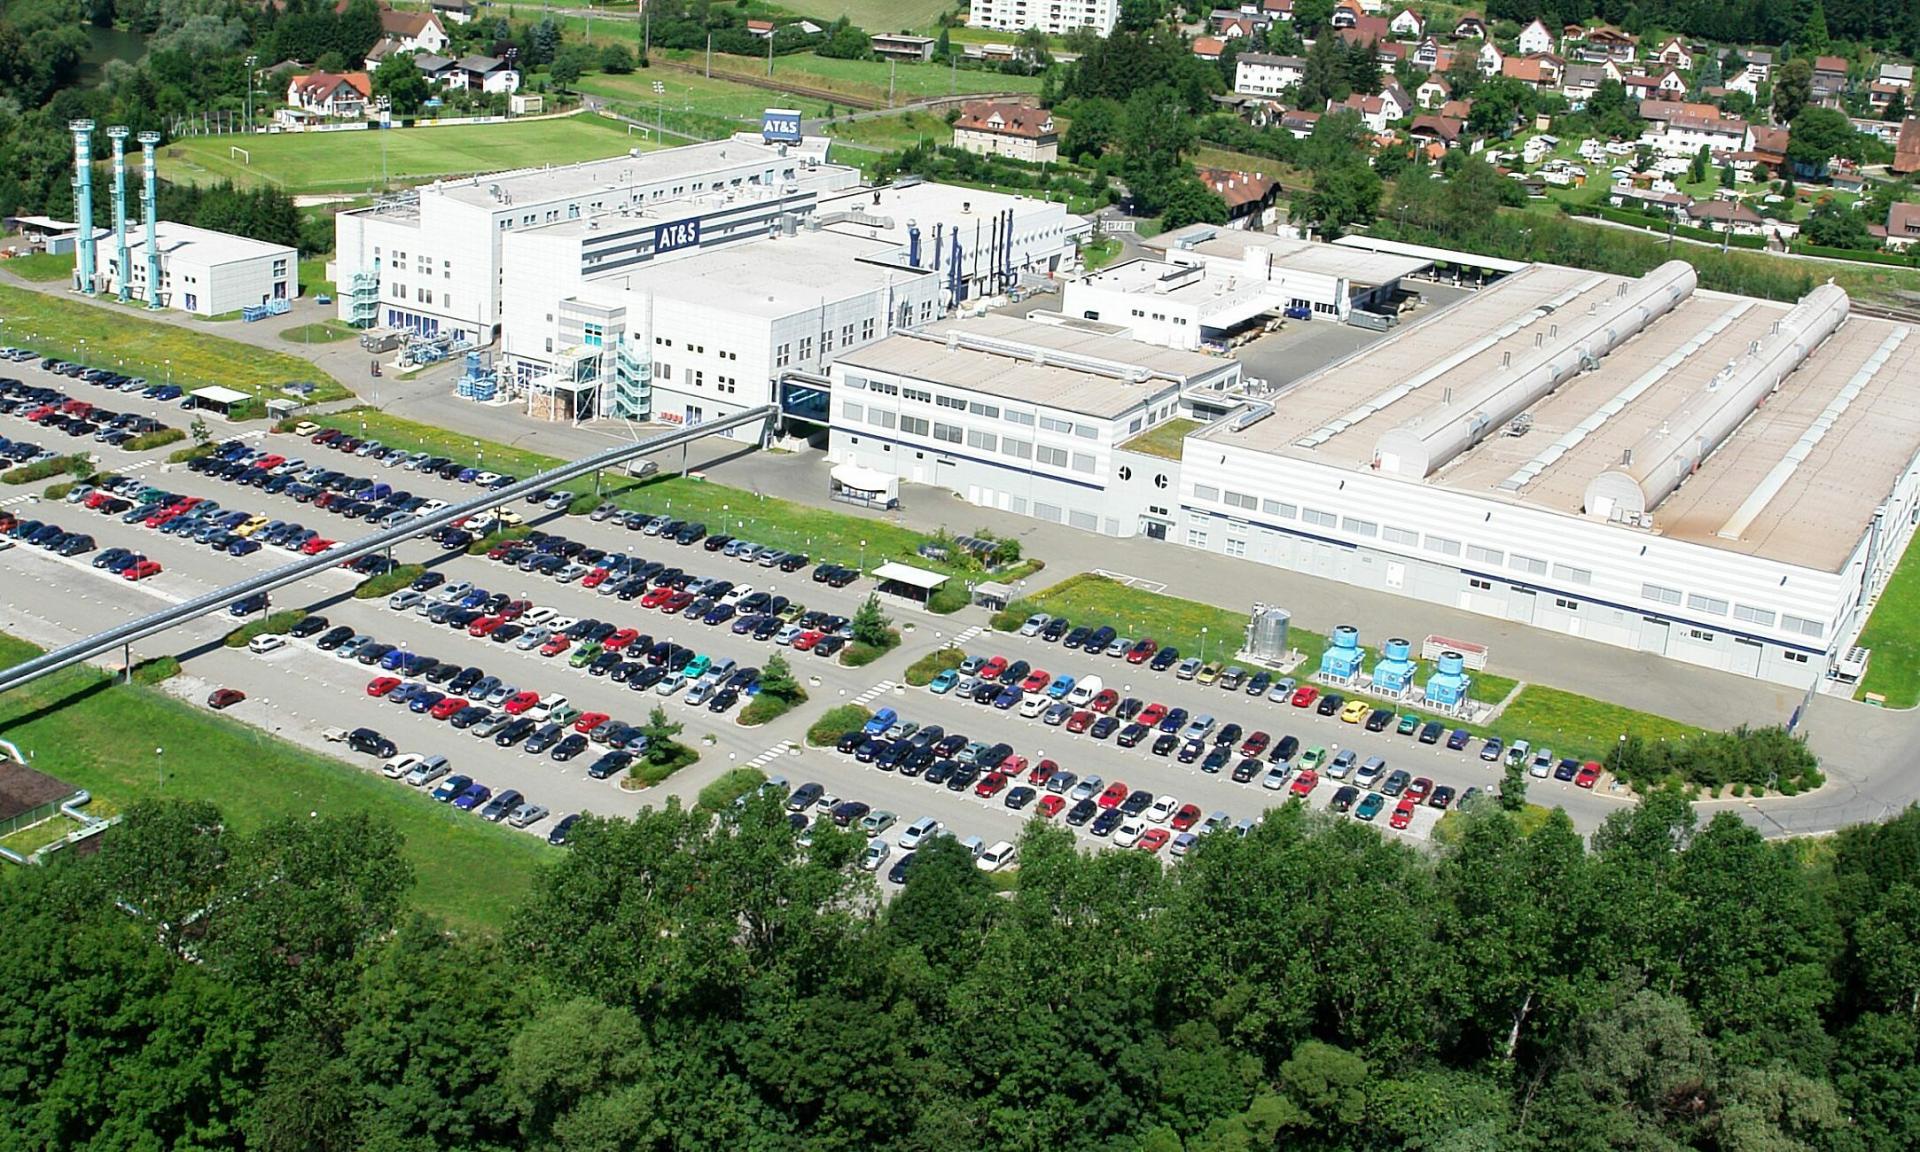 Austria's printed circuit board manufacturer seeks to build $1.8 bln plants in Vietnam